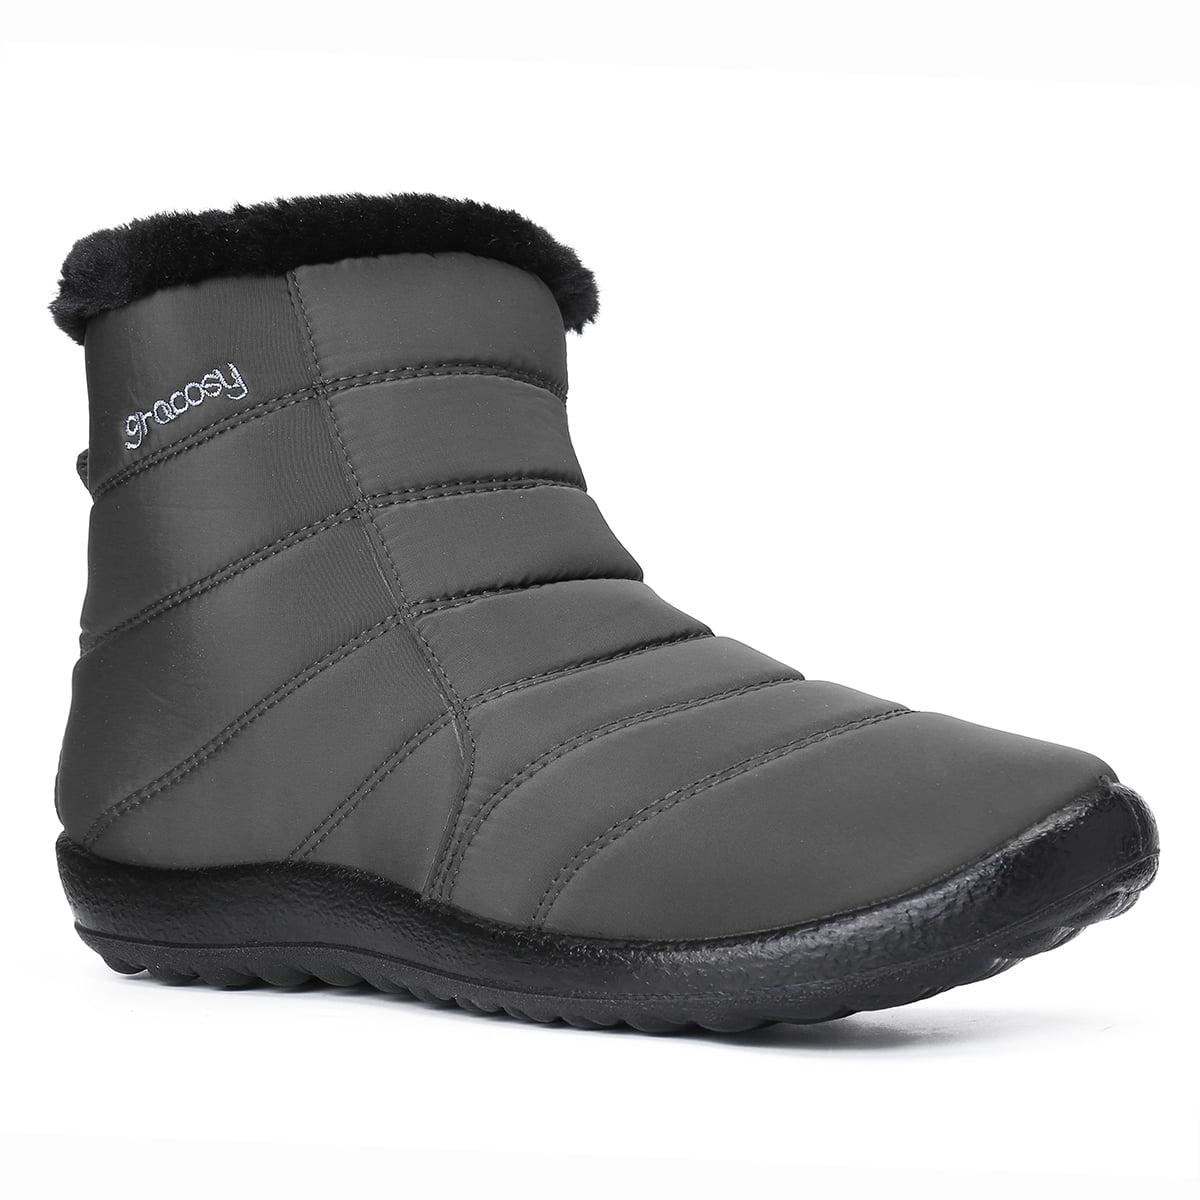 Kudosale 2020 Women Spring Winter Fashion Snow Boots Warm Ankle Boots Anti Skid High Top Shoes Walmart Com Walmart Com